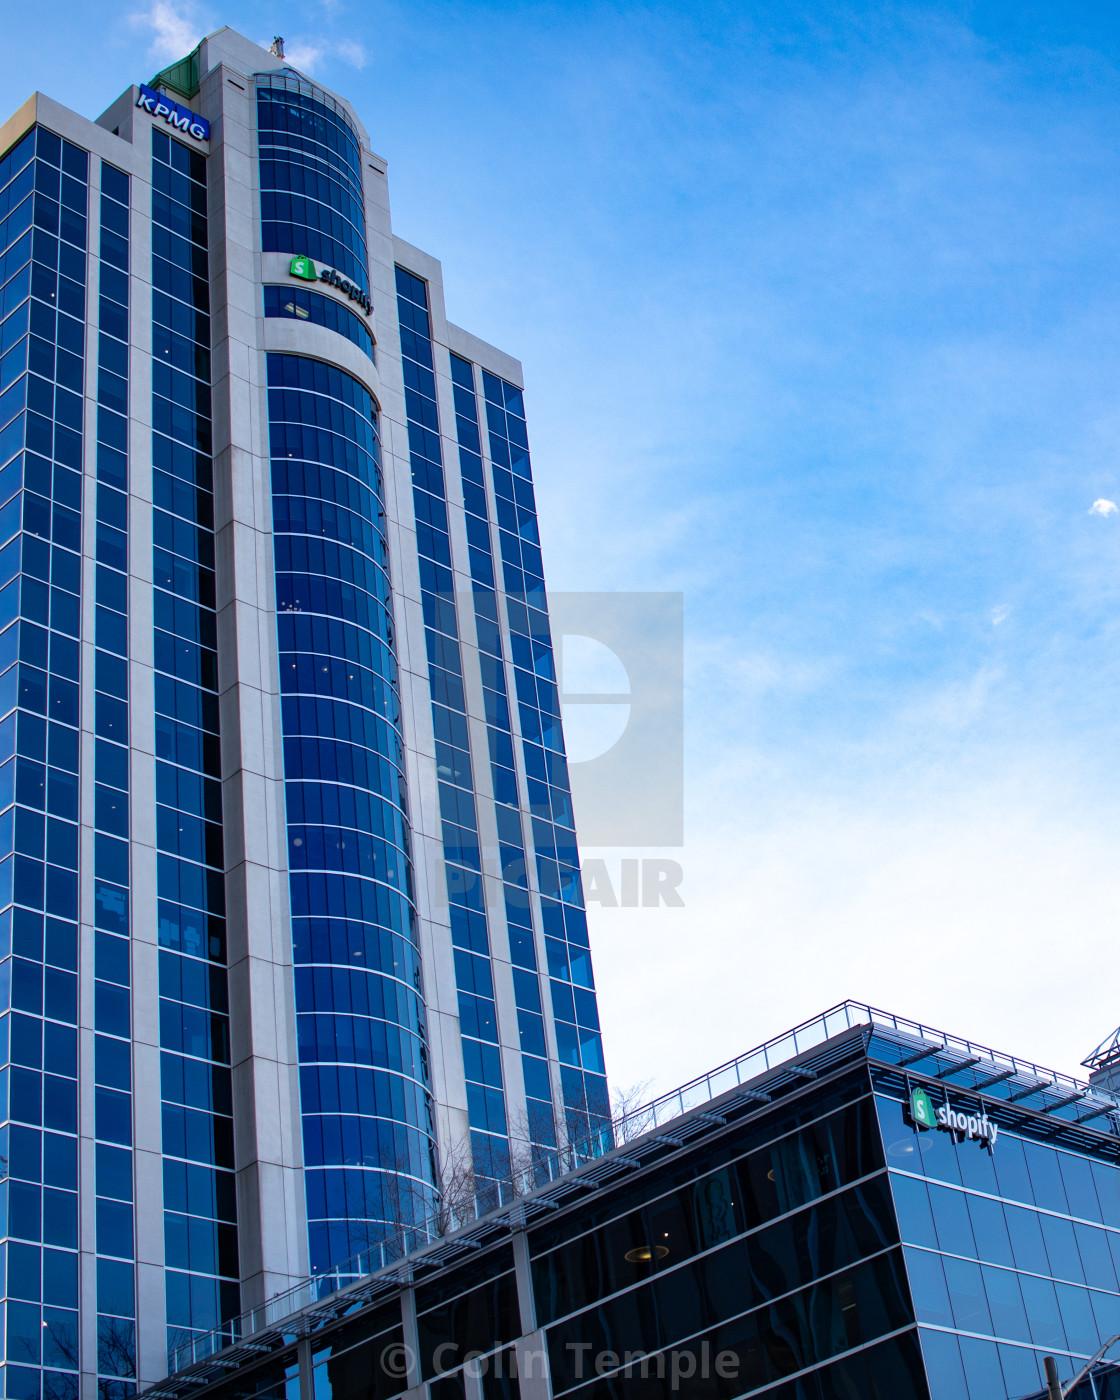 Shopify Headquarters in Ottawa, Canada